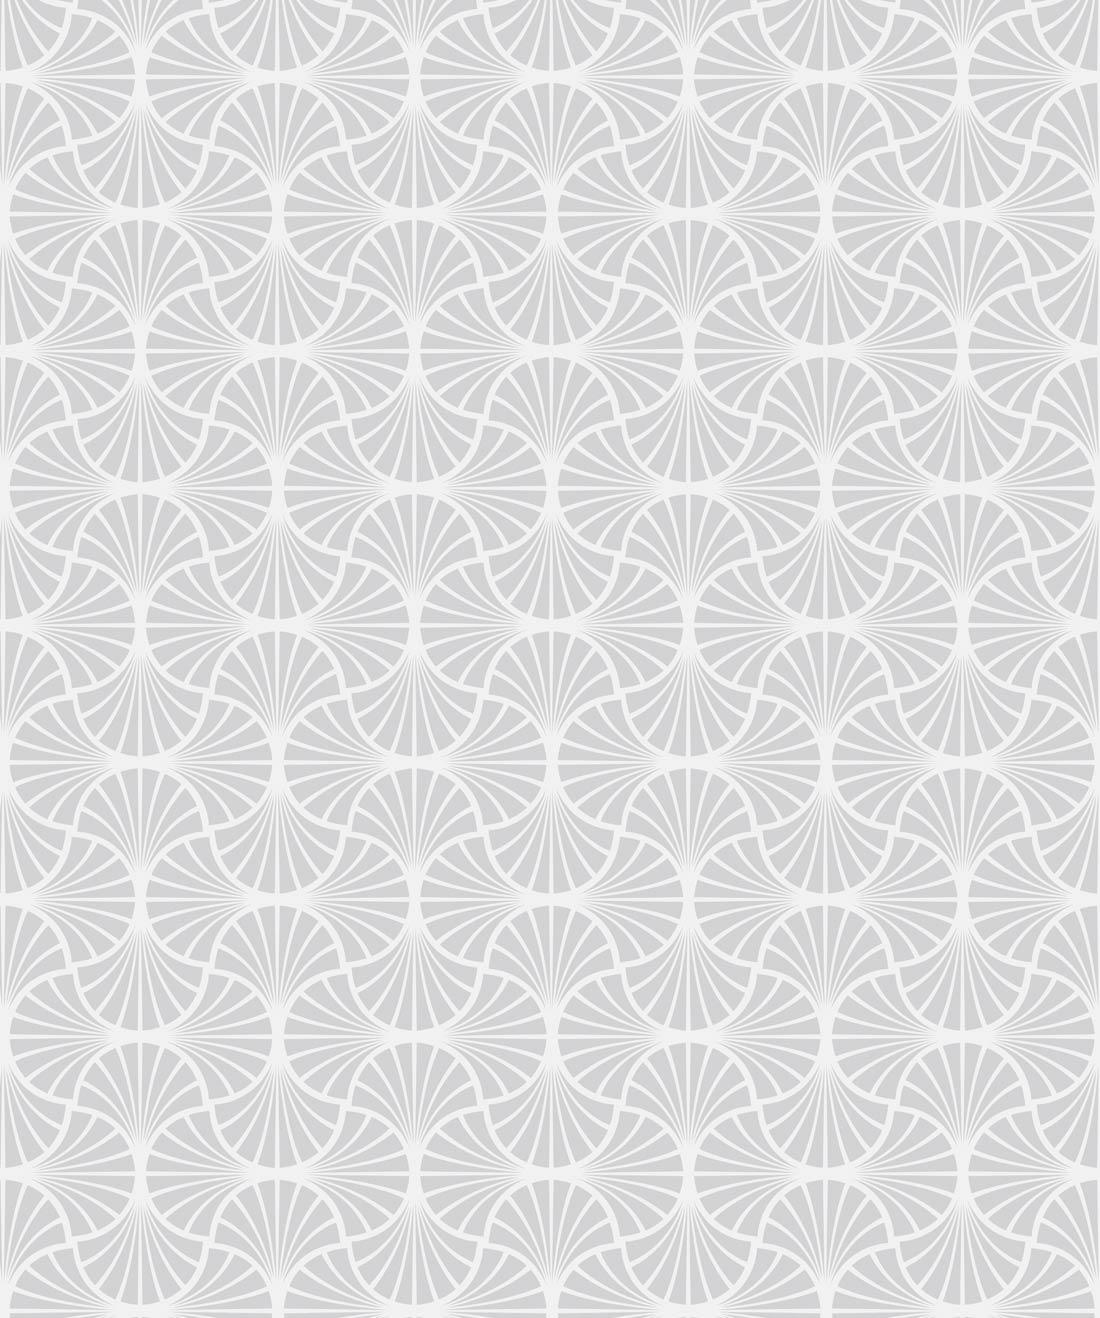 Empire Weave Wallpaper